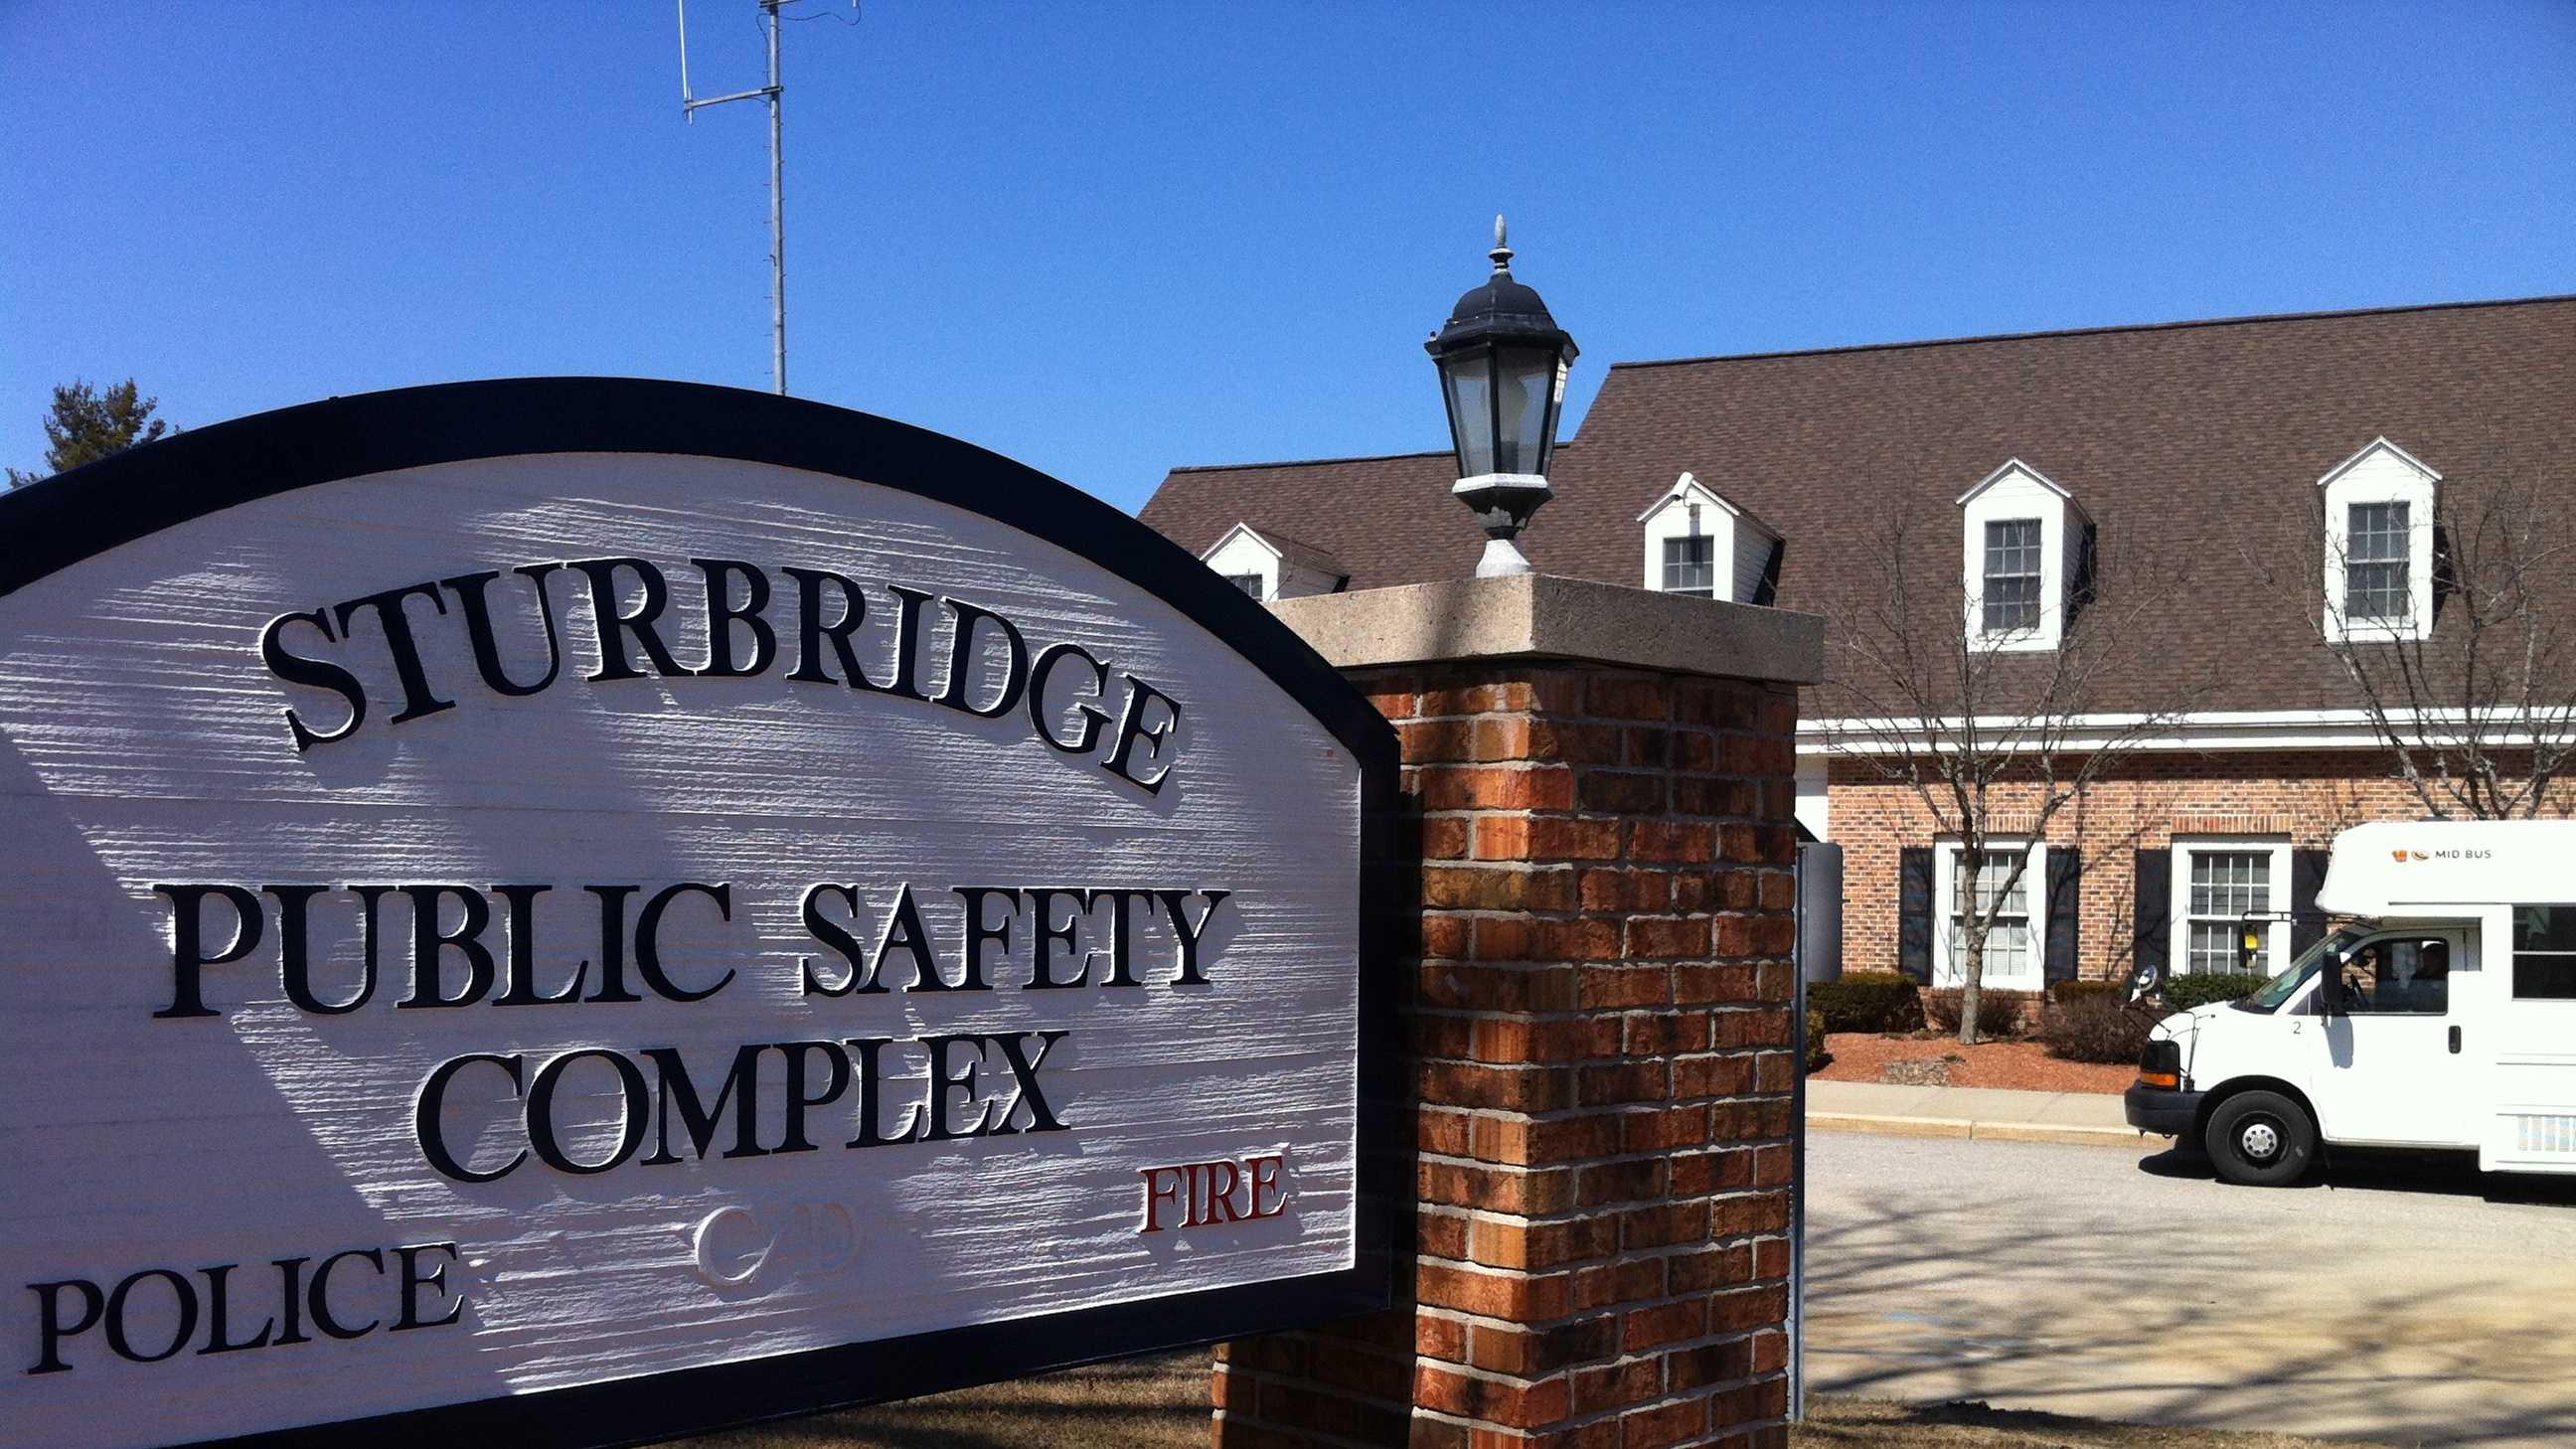 Sturbridge Fire Department